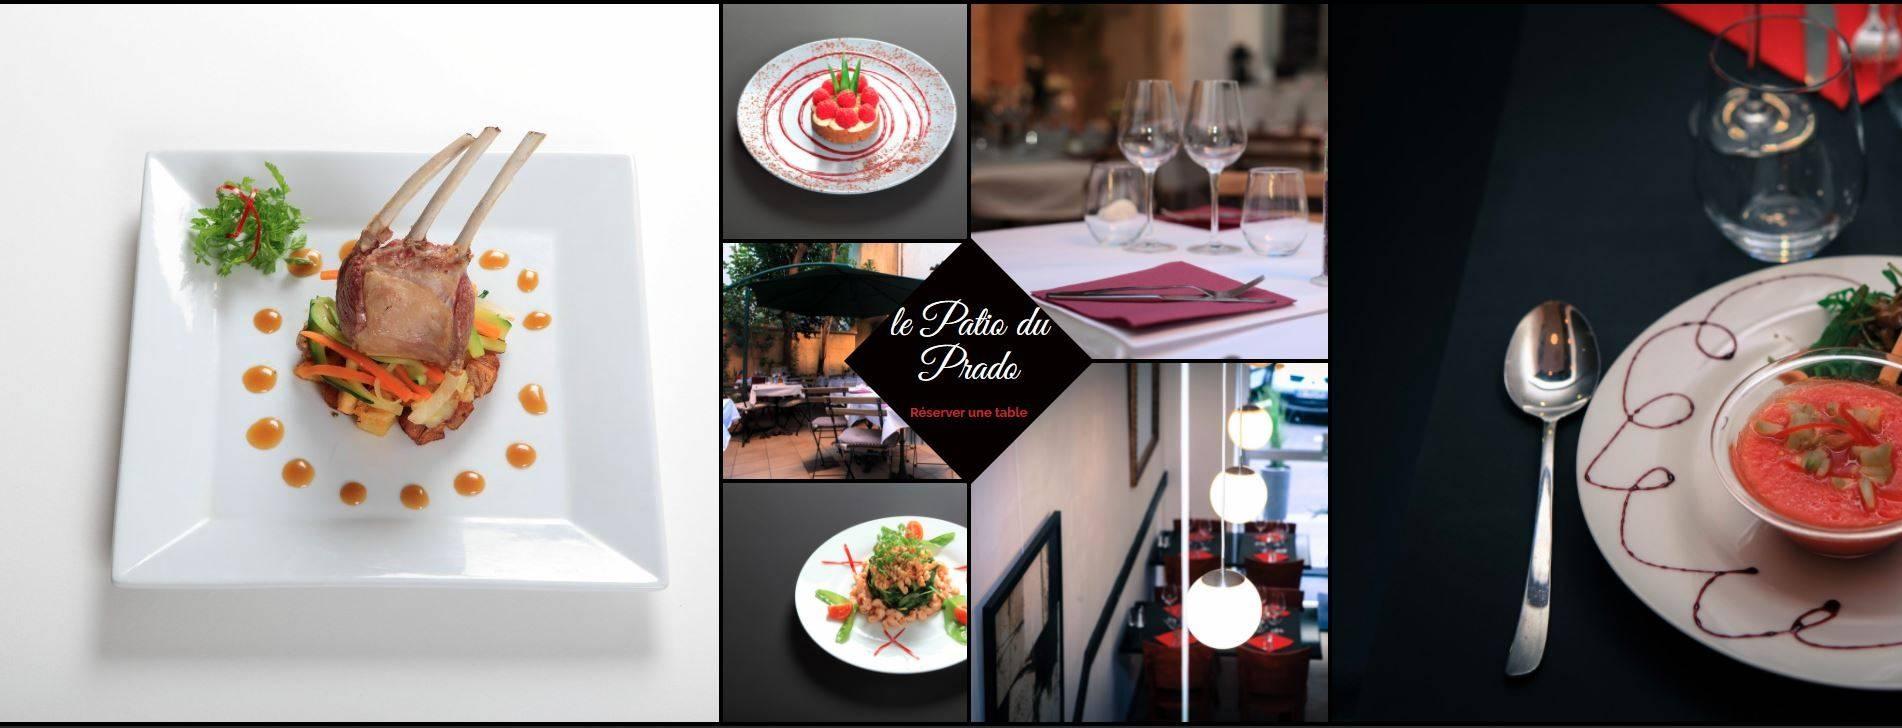 Le Restaurant - le Patio du Prado - Marseille